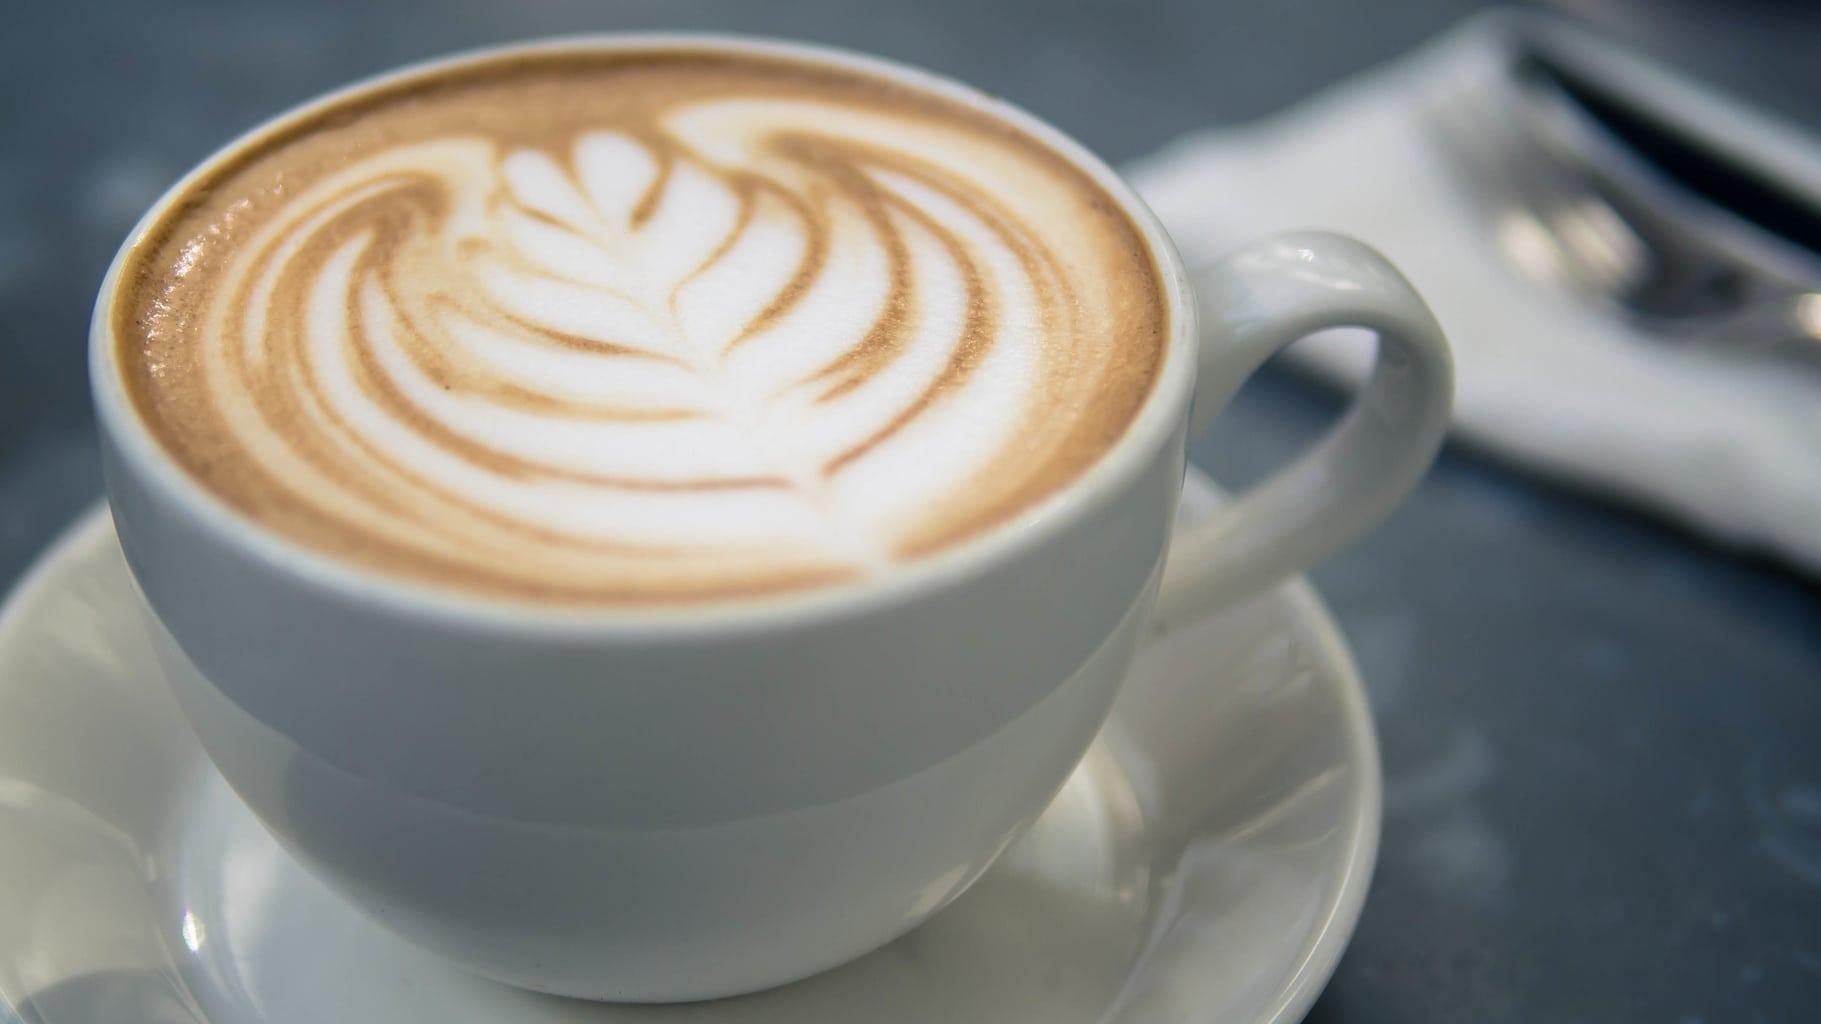 Latte with milk swirl art